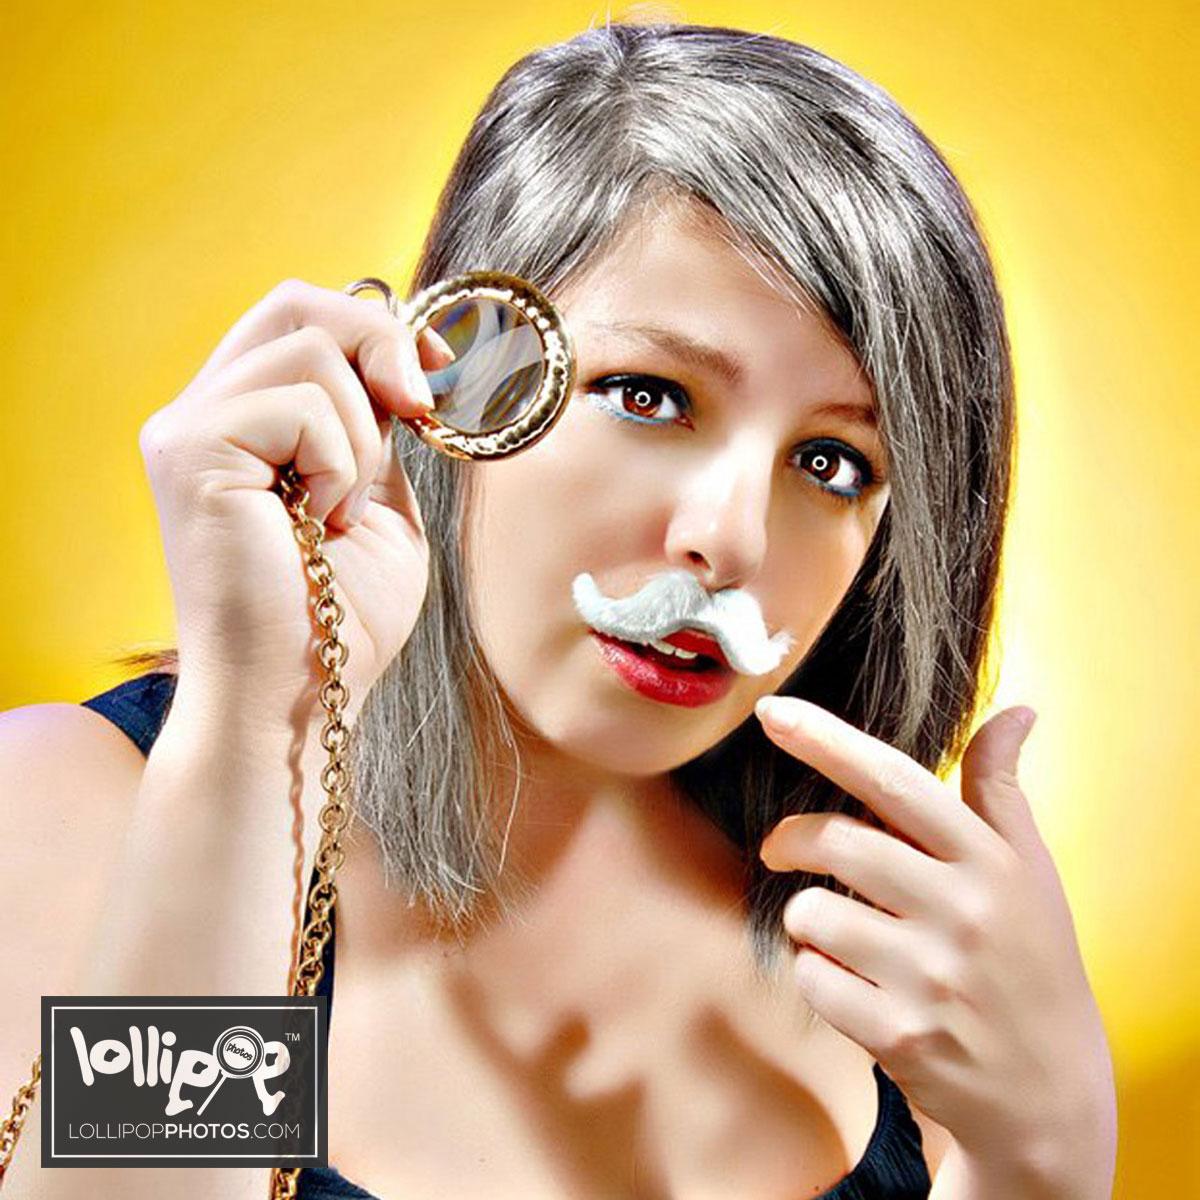 msdig-nora-canfield-lollipop-photos-091.jpg